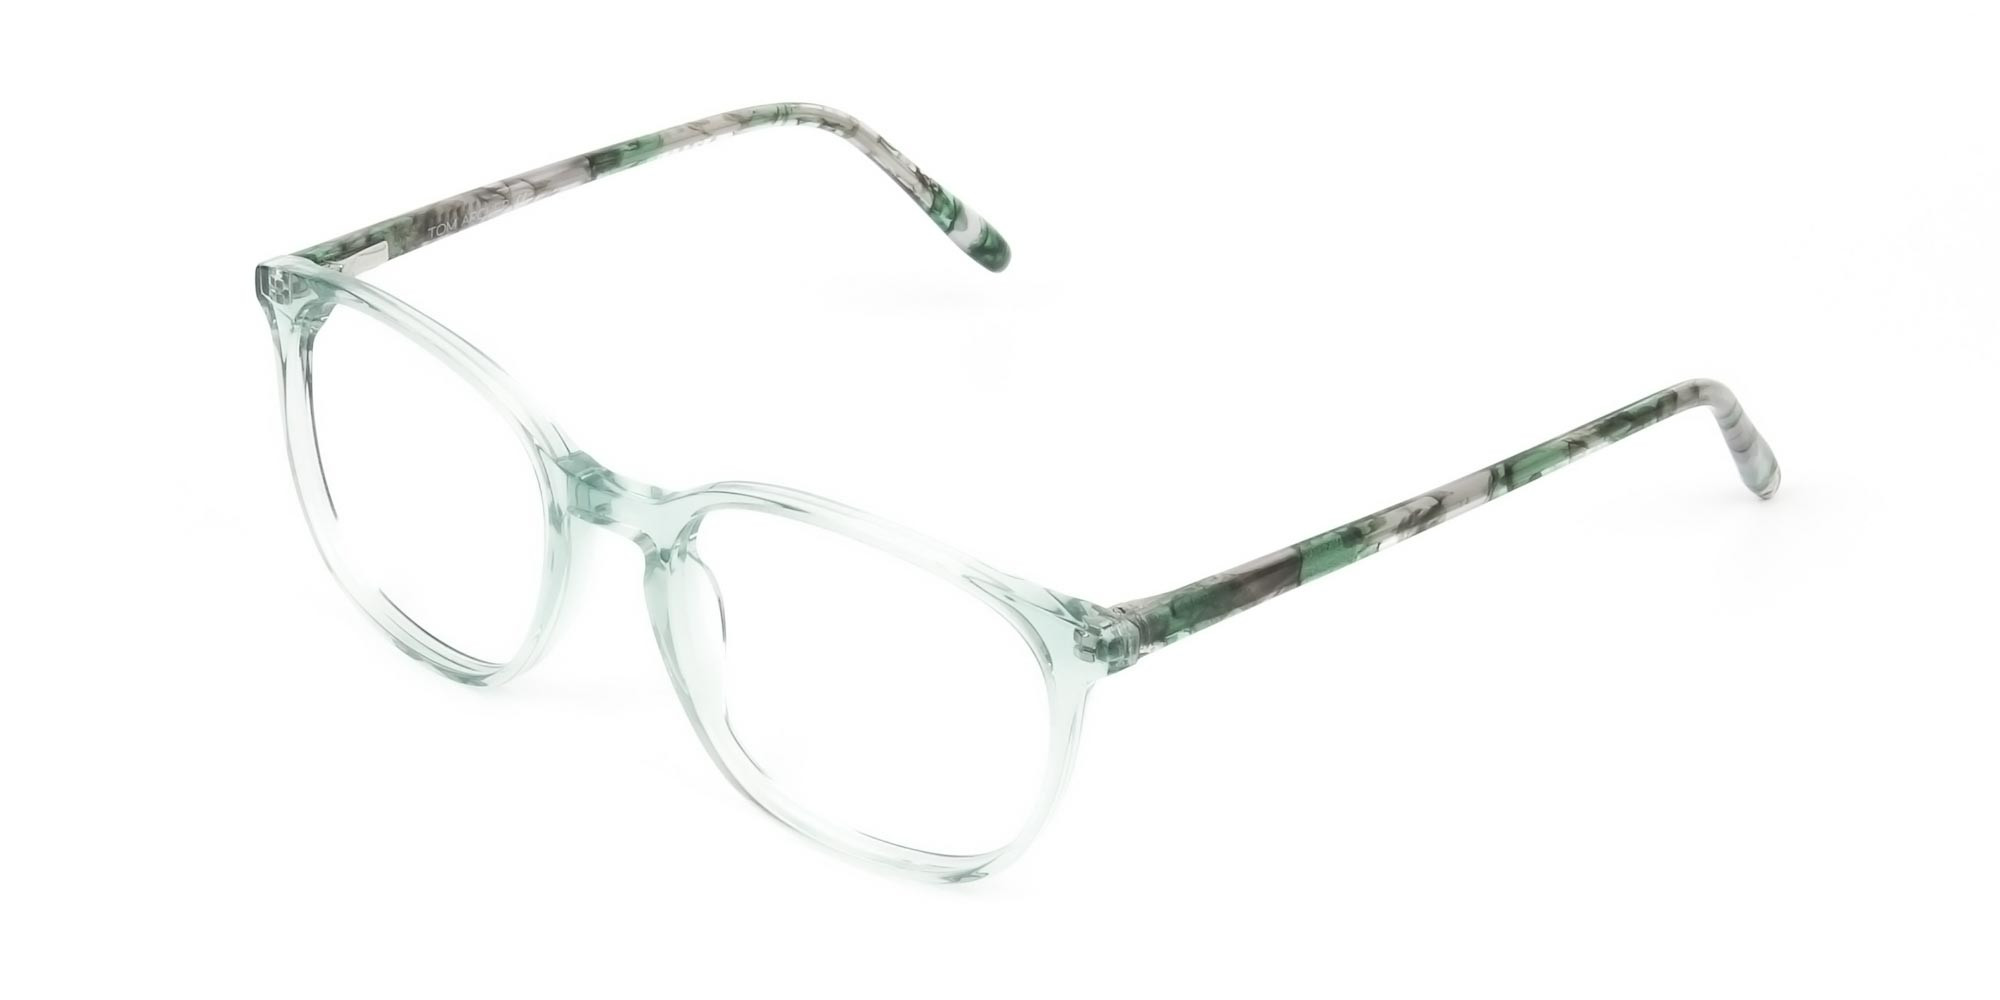 Teal Crysral Green Glasses in Wayfarer - 3